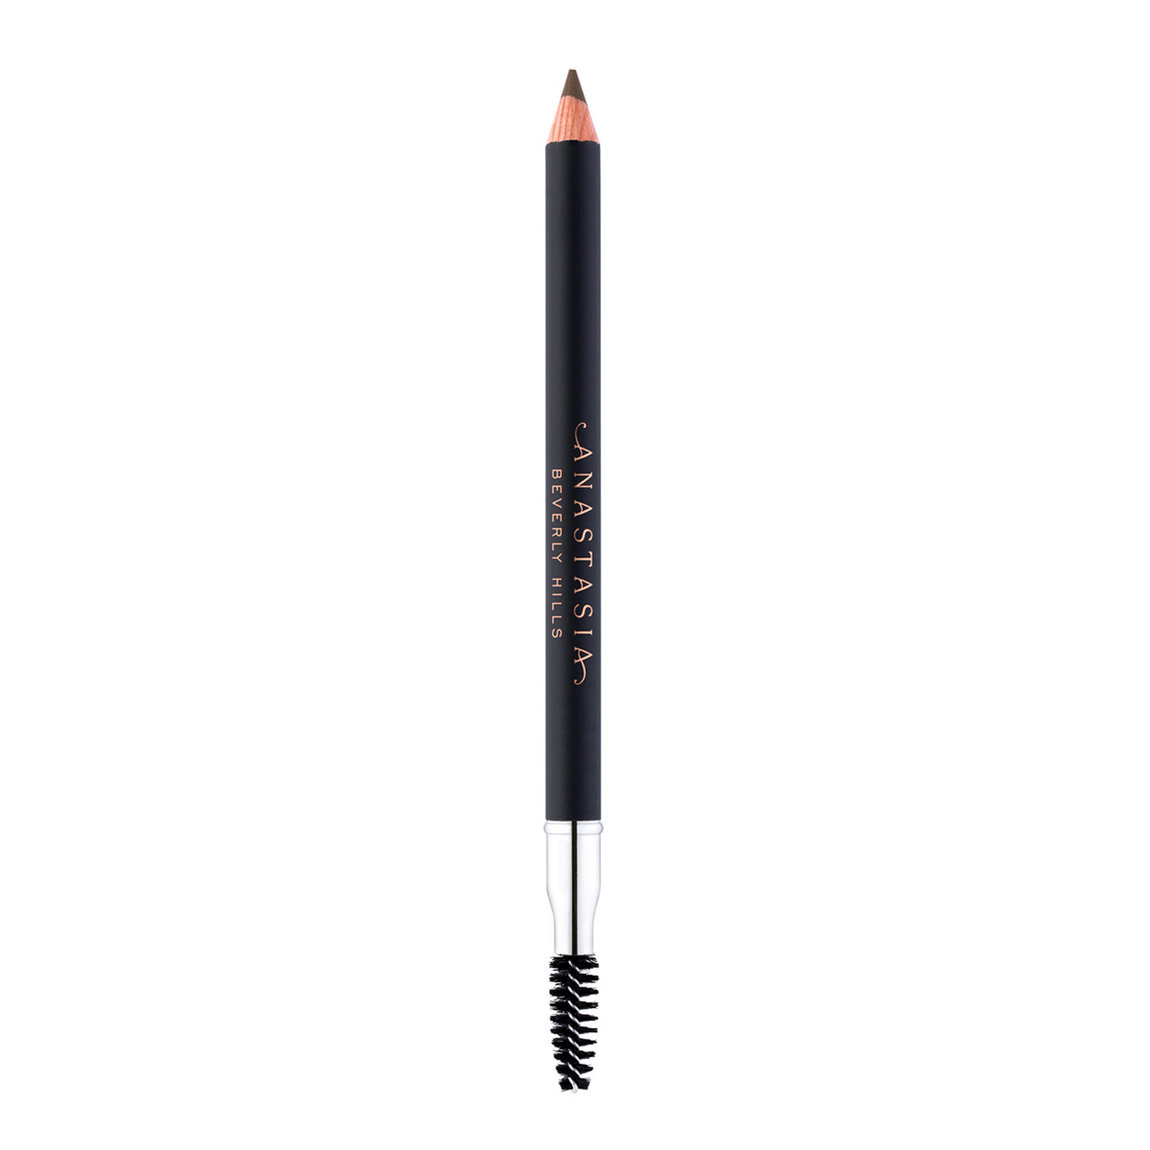 Anastasia Beverly Hills Perfect Brow Pencil Medium Brown alternative view 1.